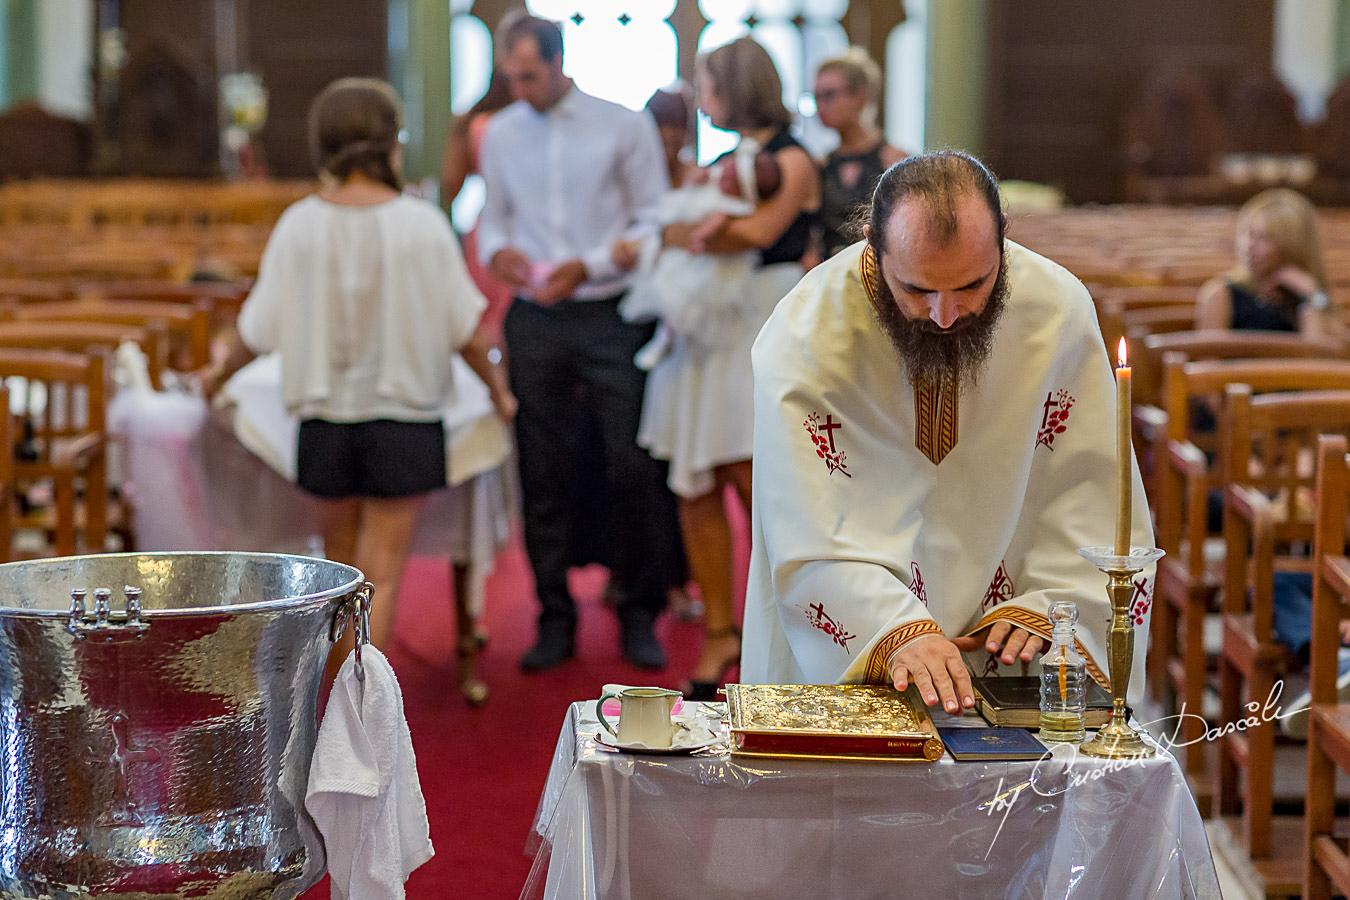 Angelic Christening in Limassol - 29